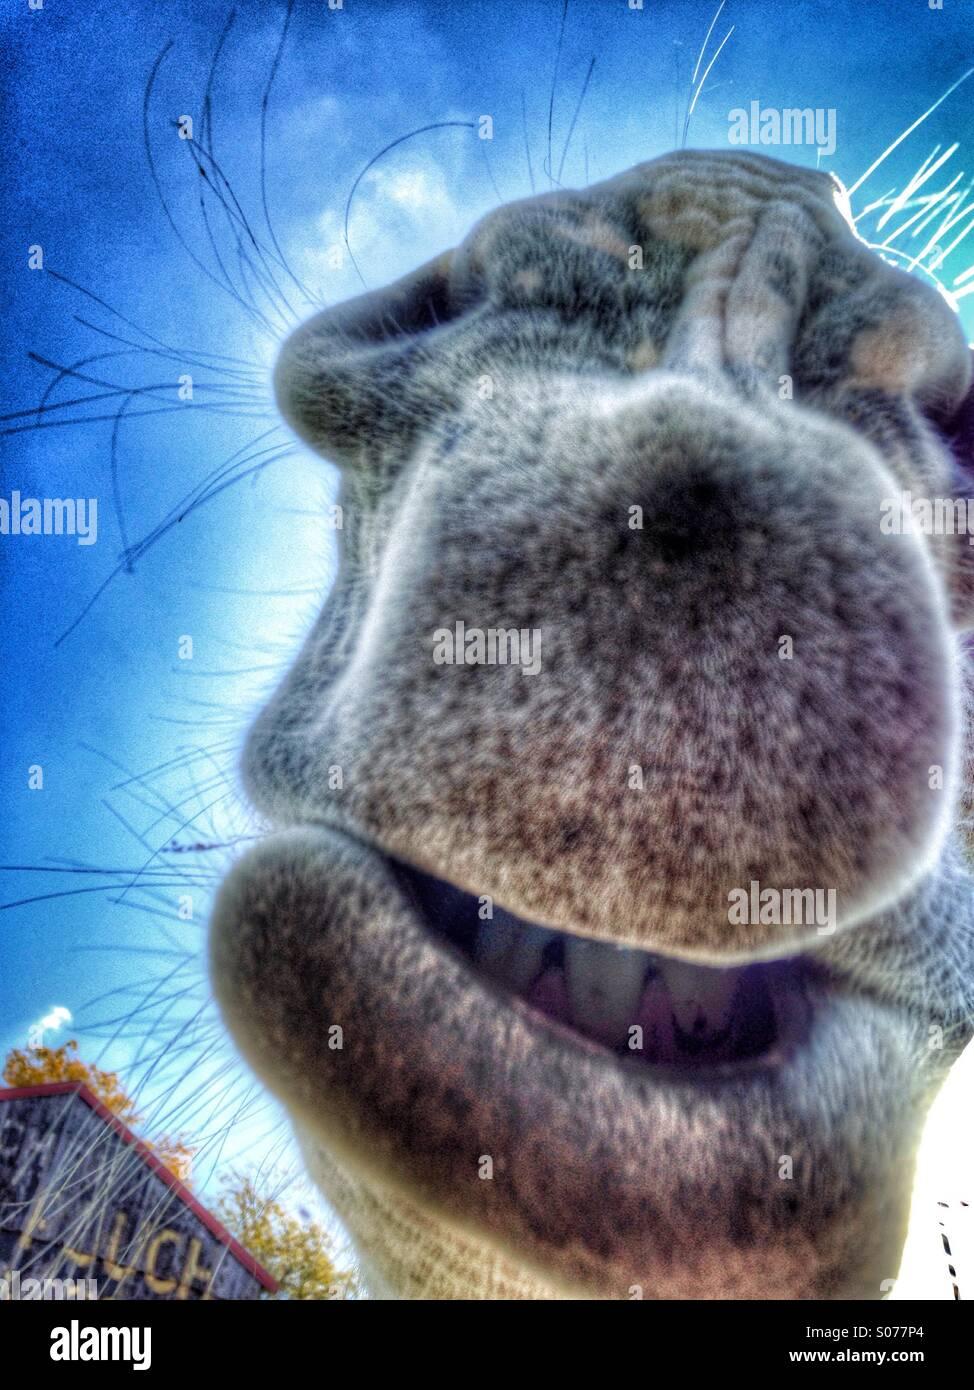 A mammoth donkey's lips. - Stock Image